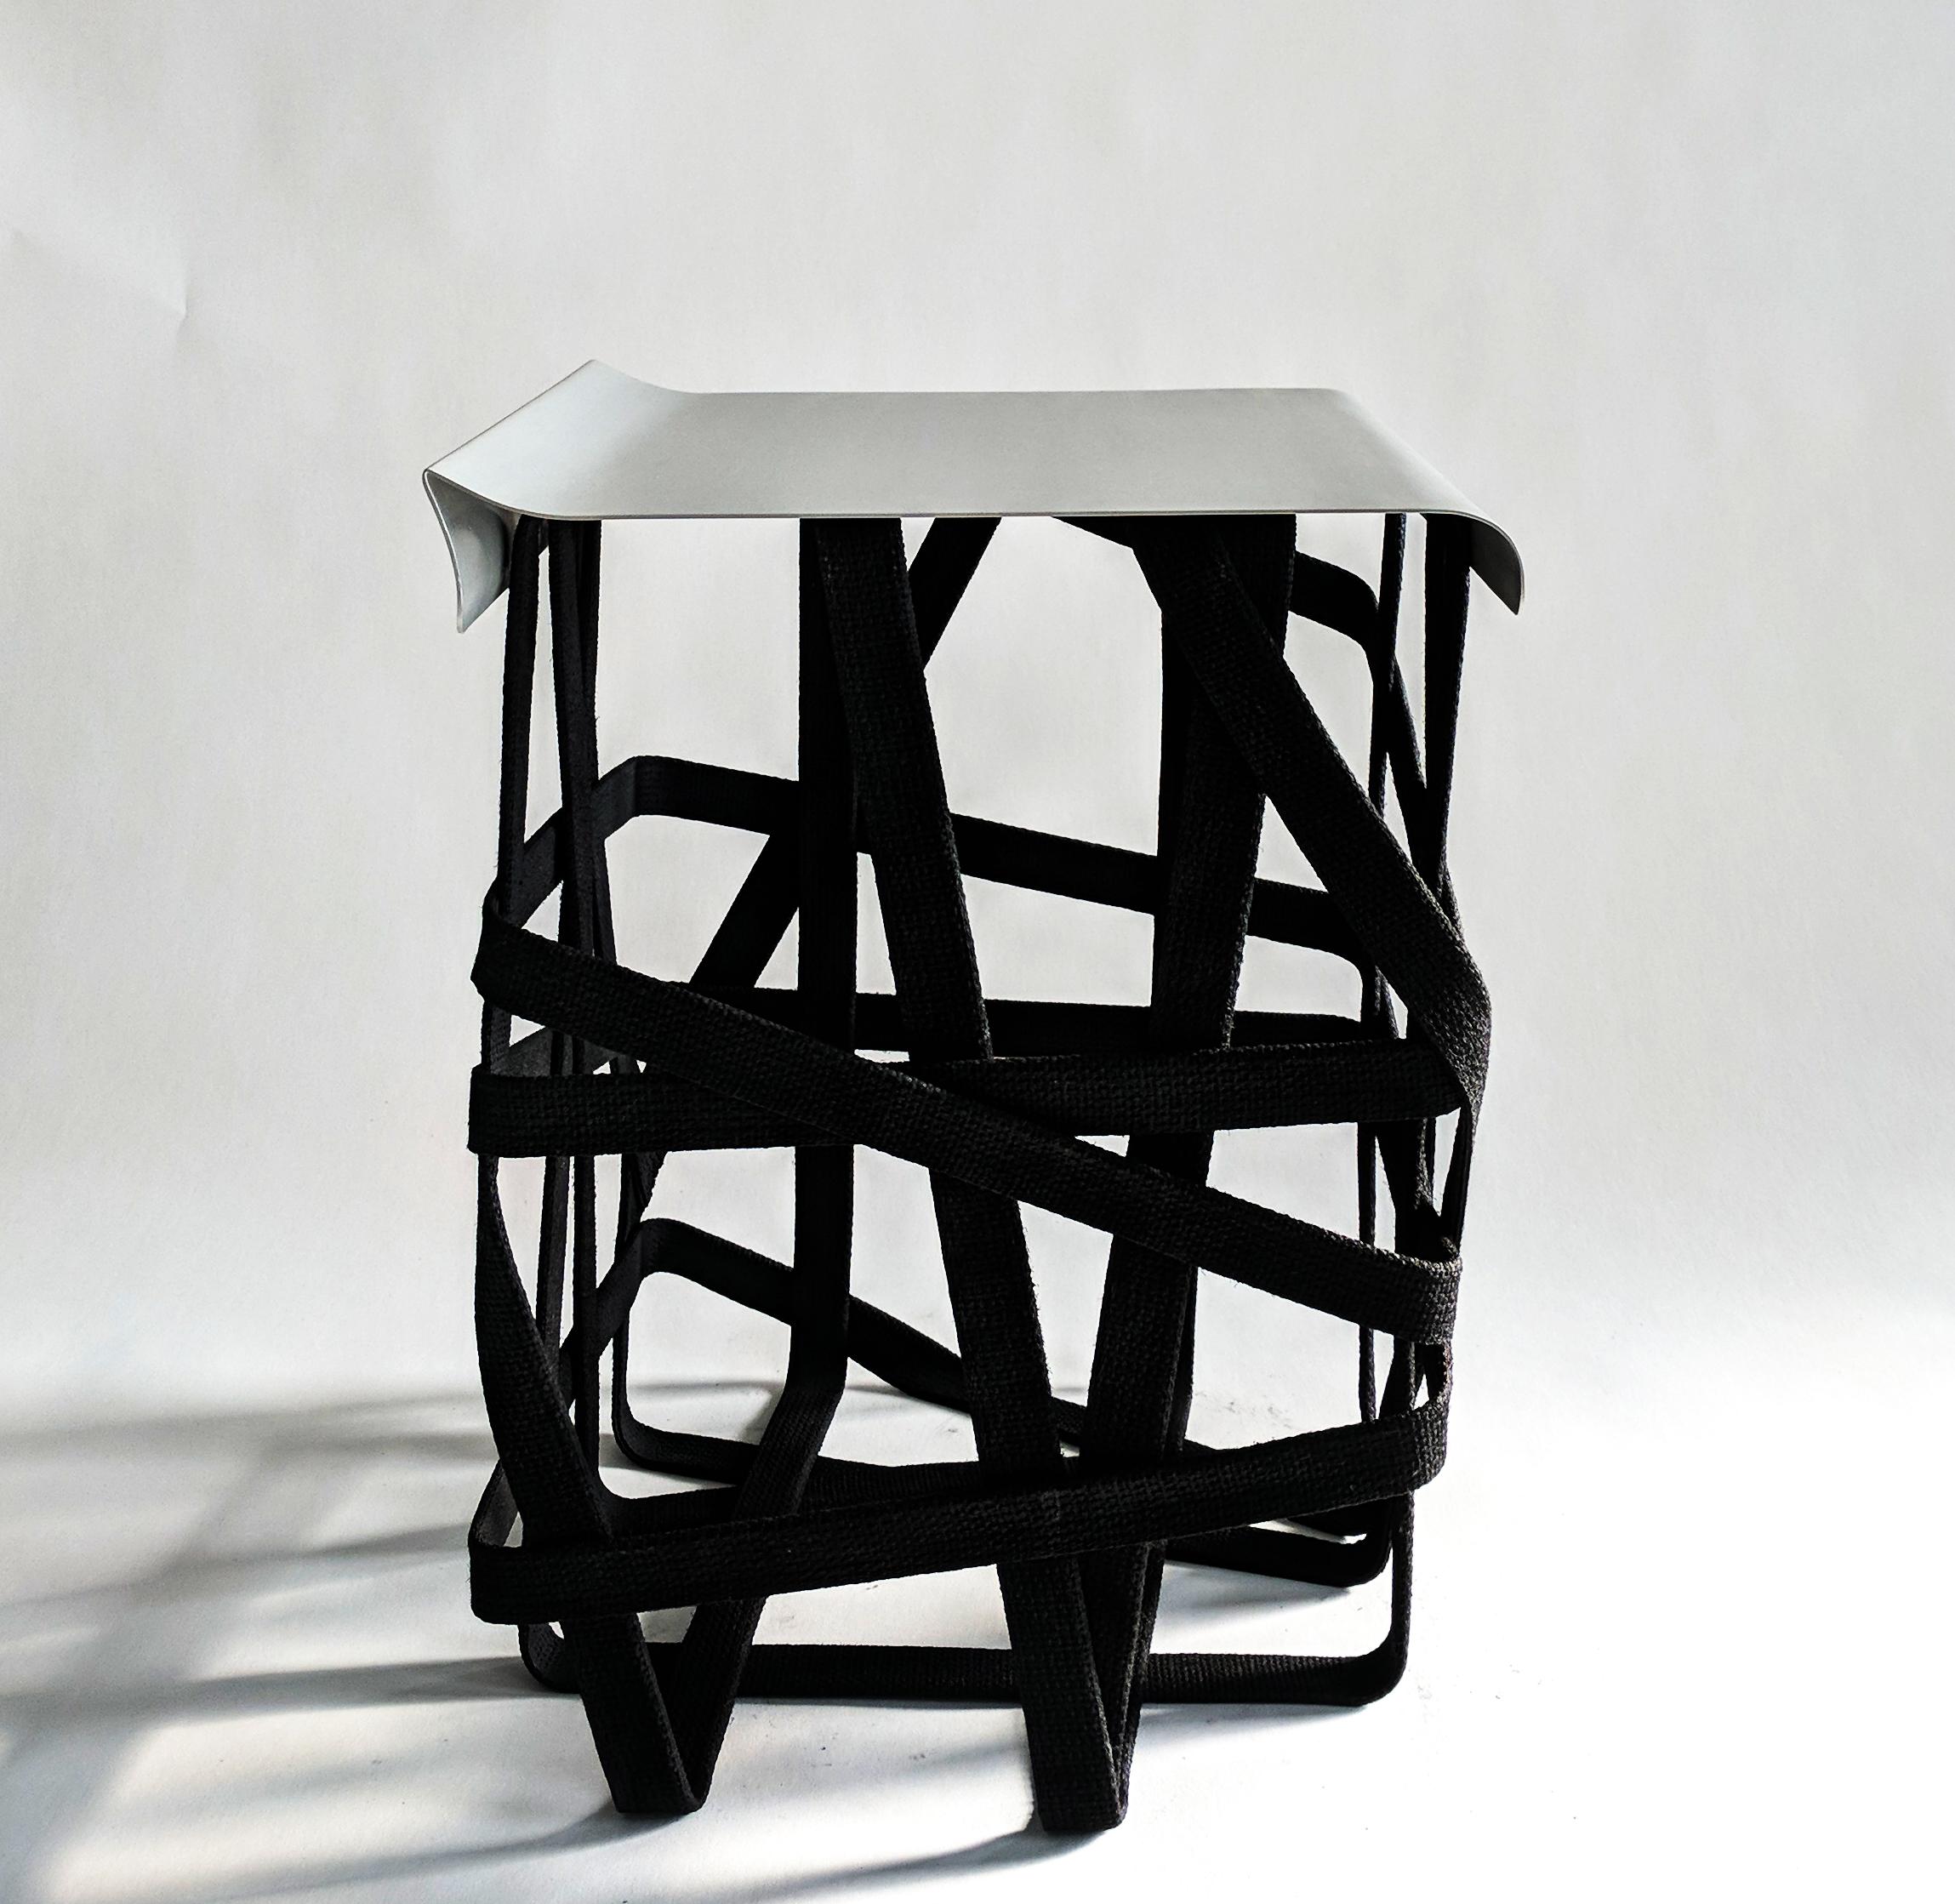 the Racer stool top image 3.jpg